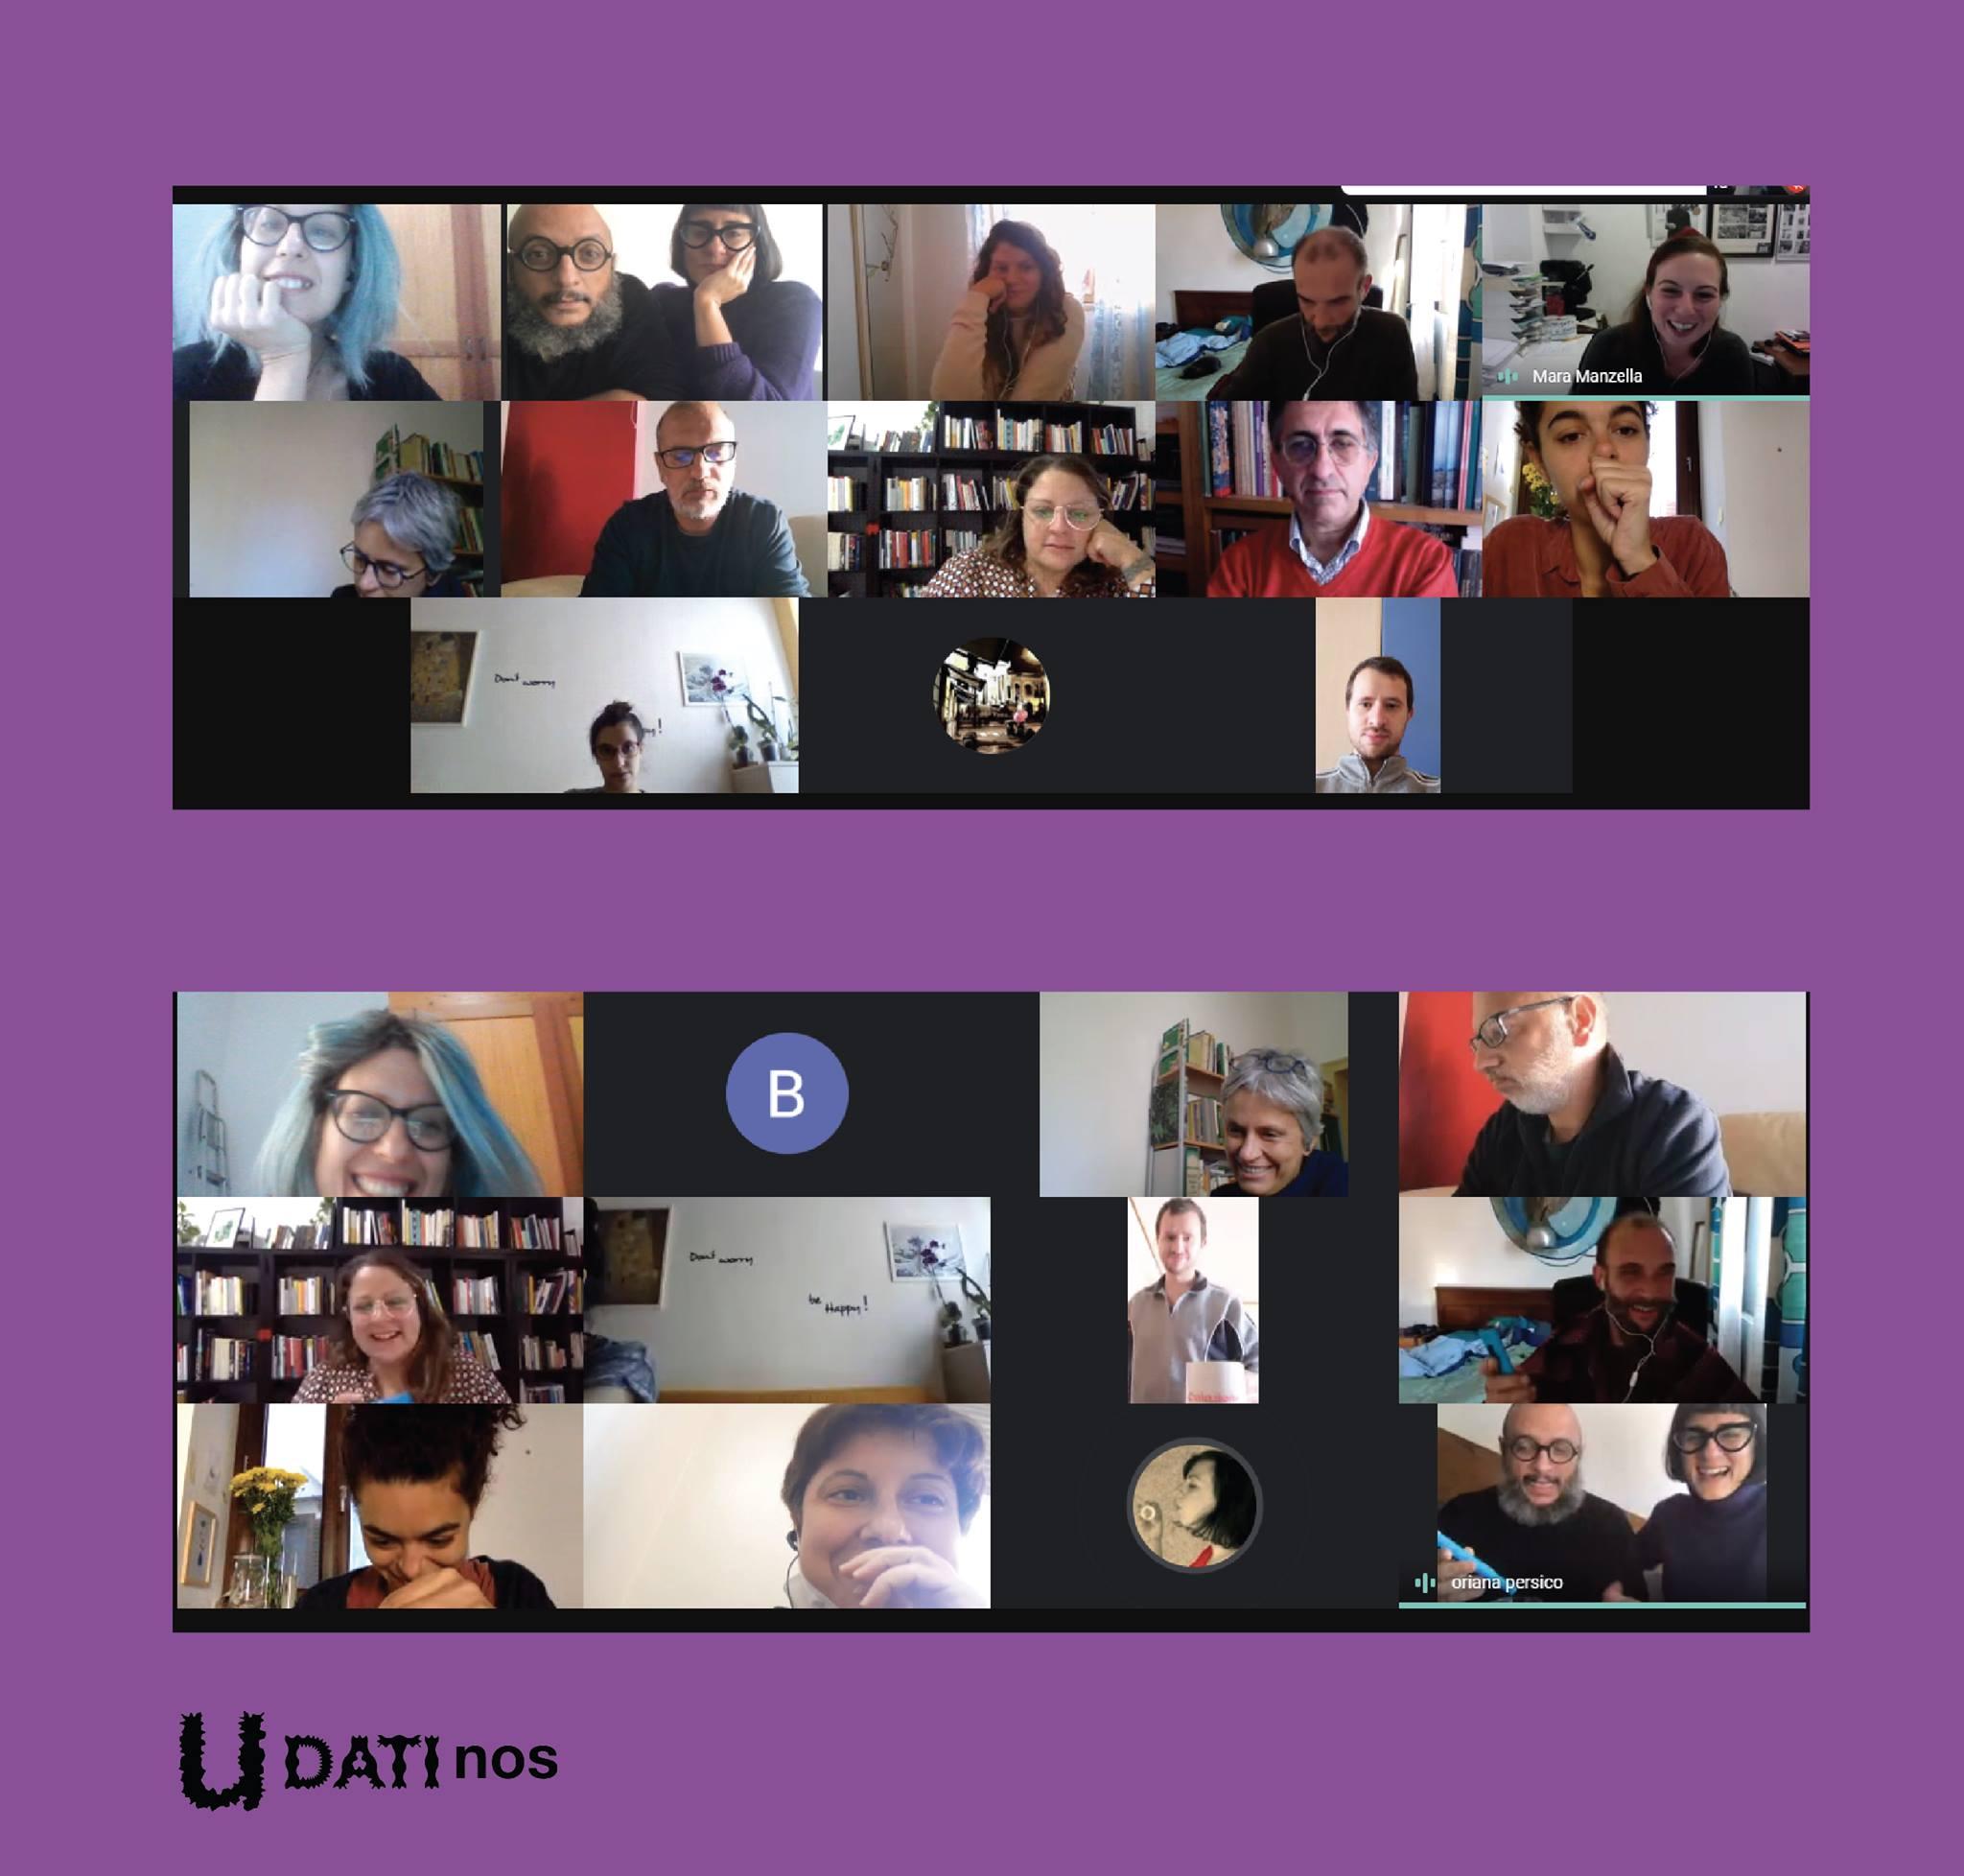 U-DATInos: online workshops